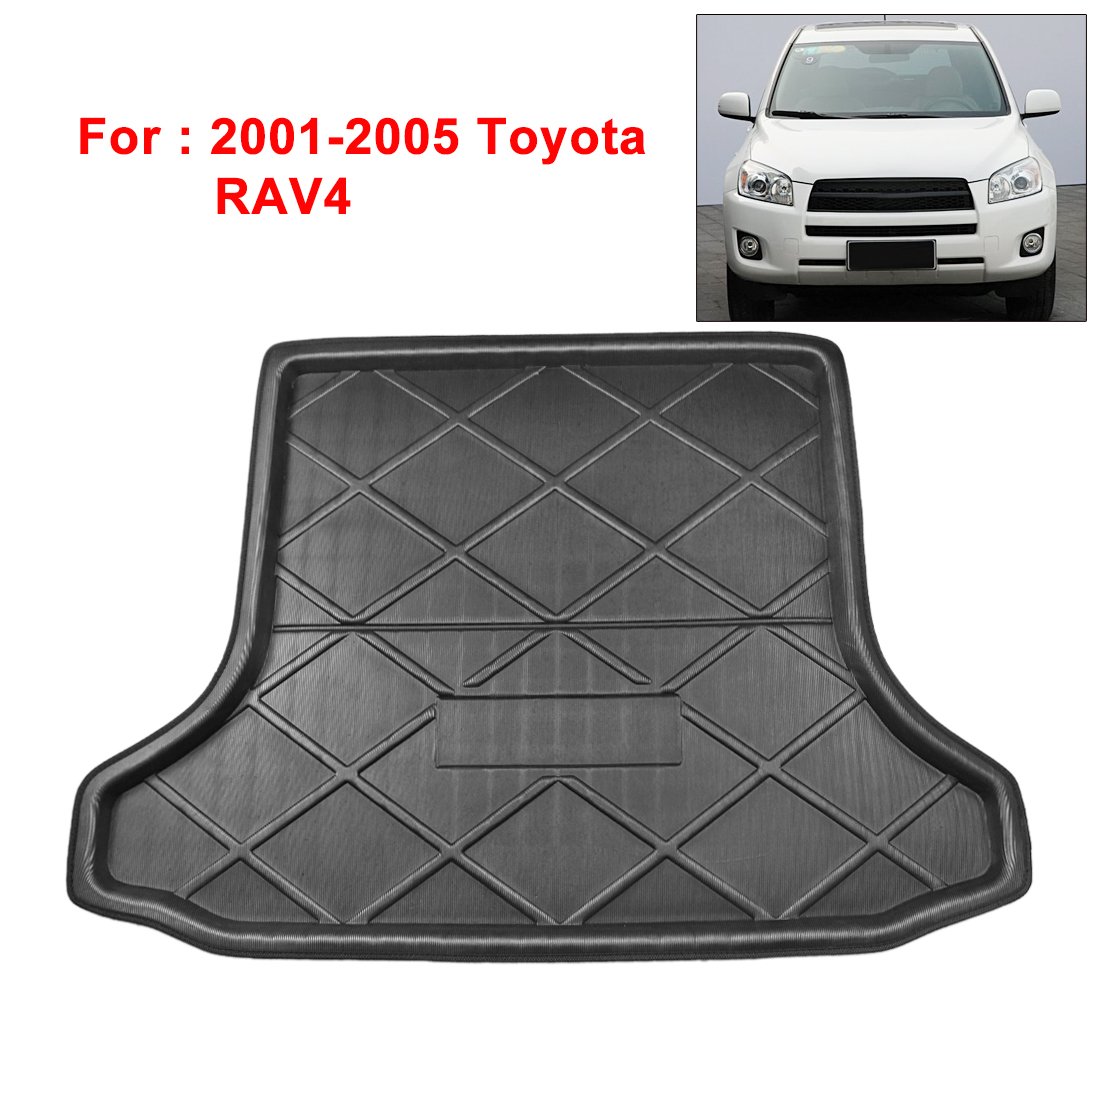 X Autohaux PE+EVA Foam Plastic Black Anti-dirty Rear Trunk Boot Liner Cargo Mat Floor Tray Cover Pad For Toyota RAV4 2001-2005